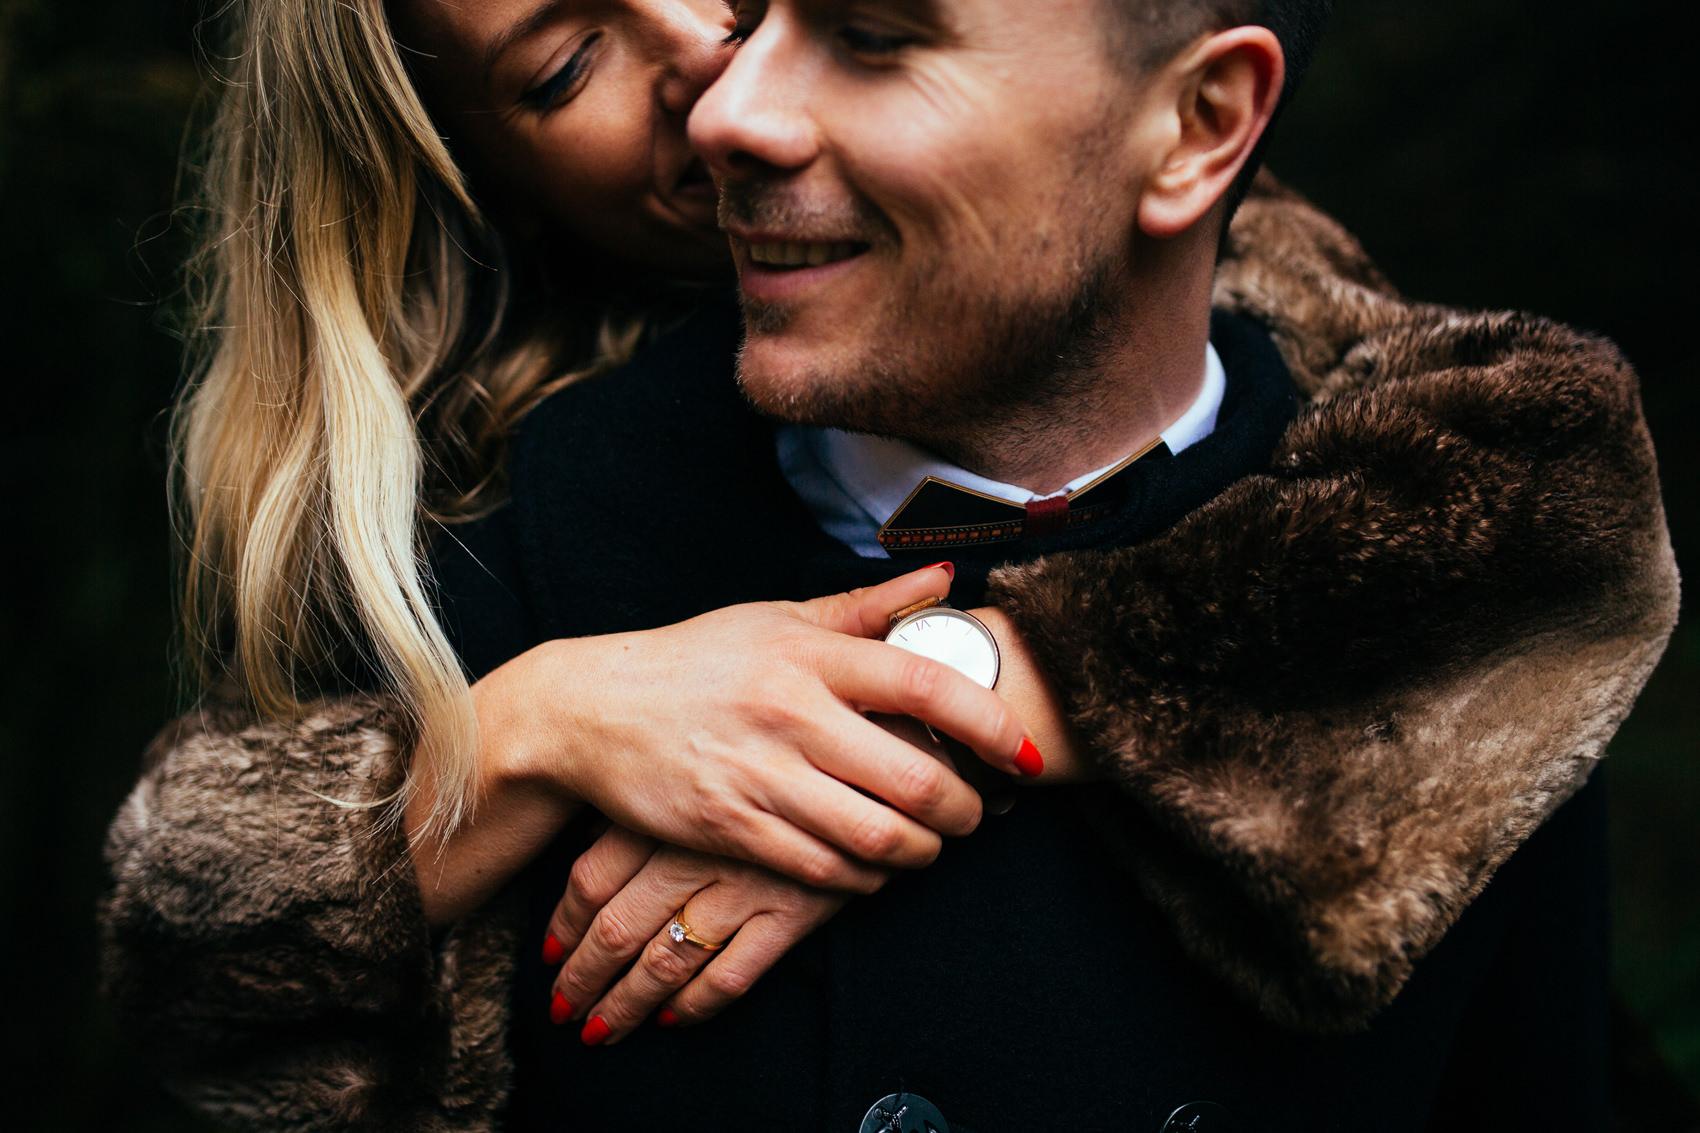 Love_session_arrochar_scottland_Anna+_and_Euan-40.jpg